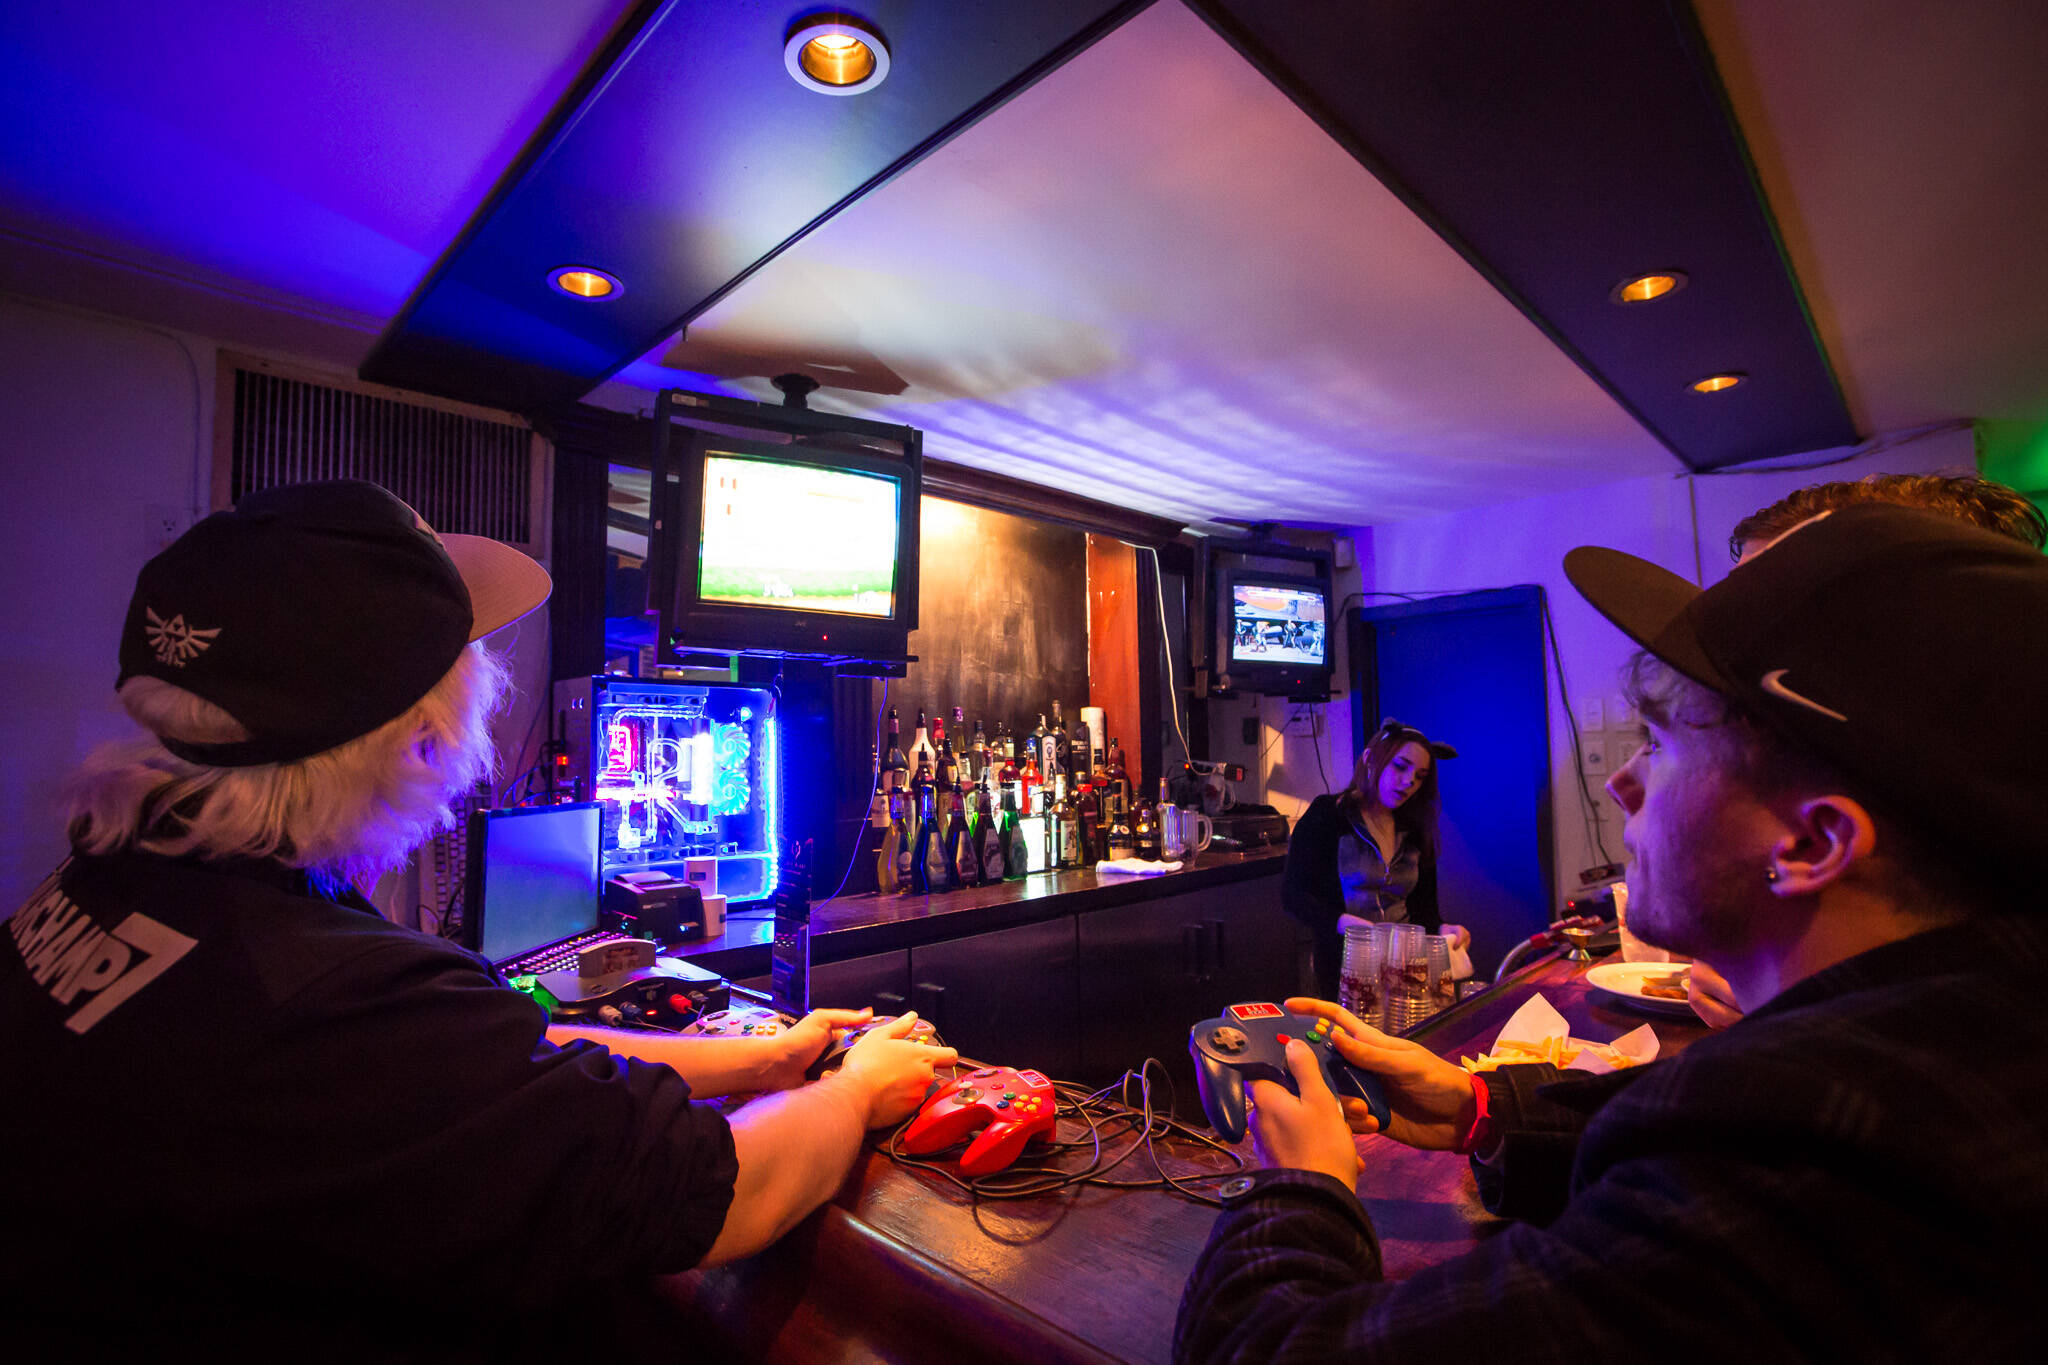 Raiders eSports Centre Toronto